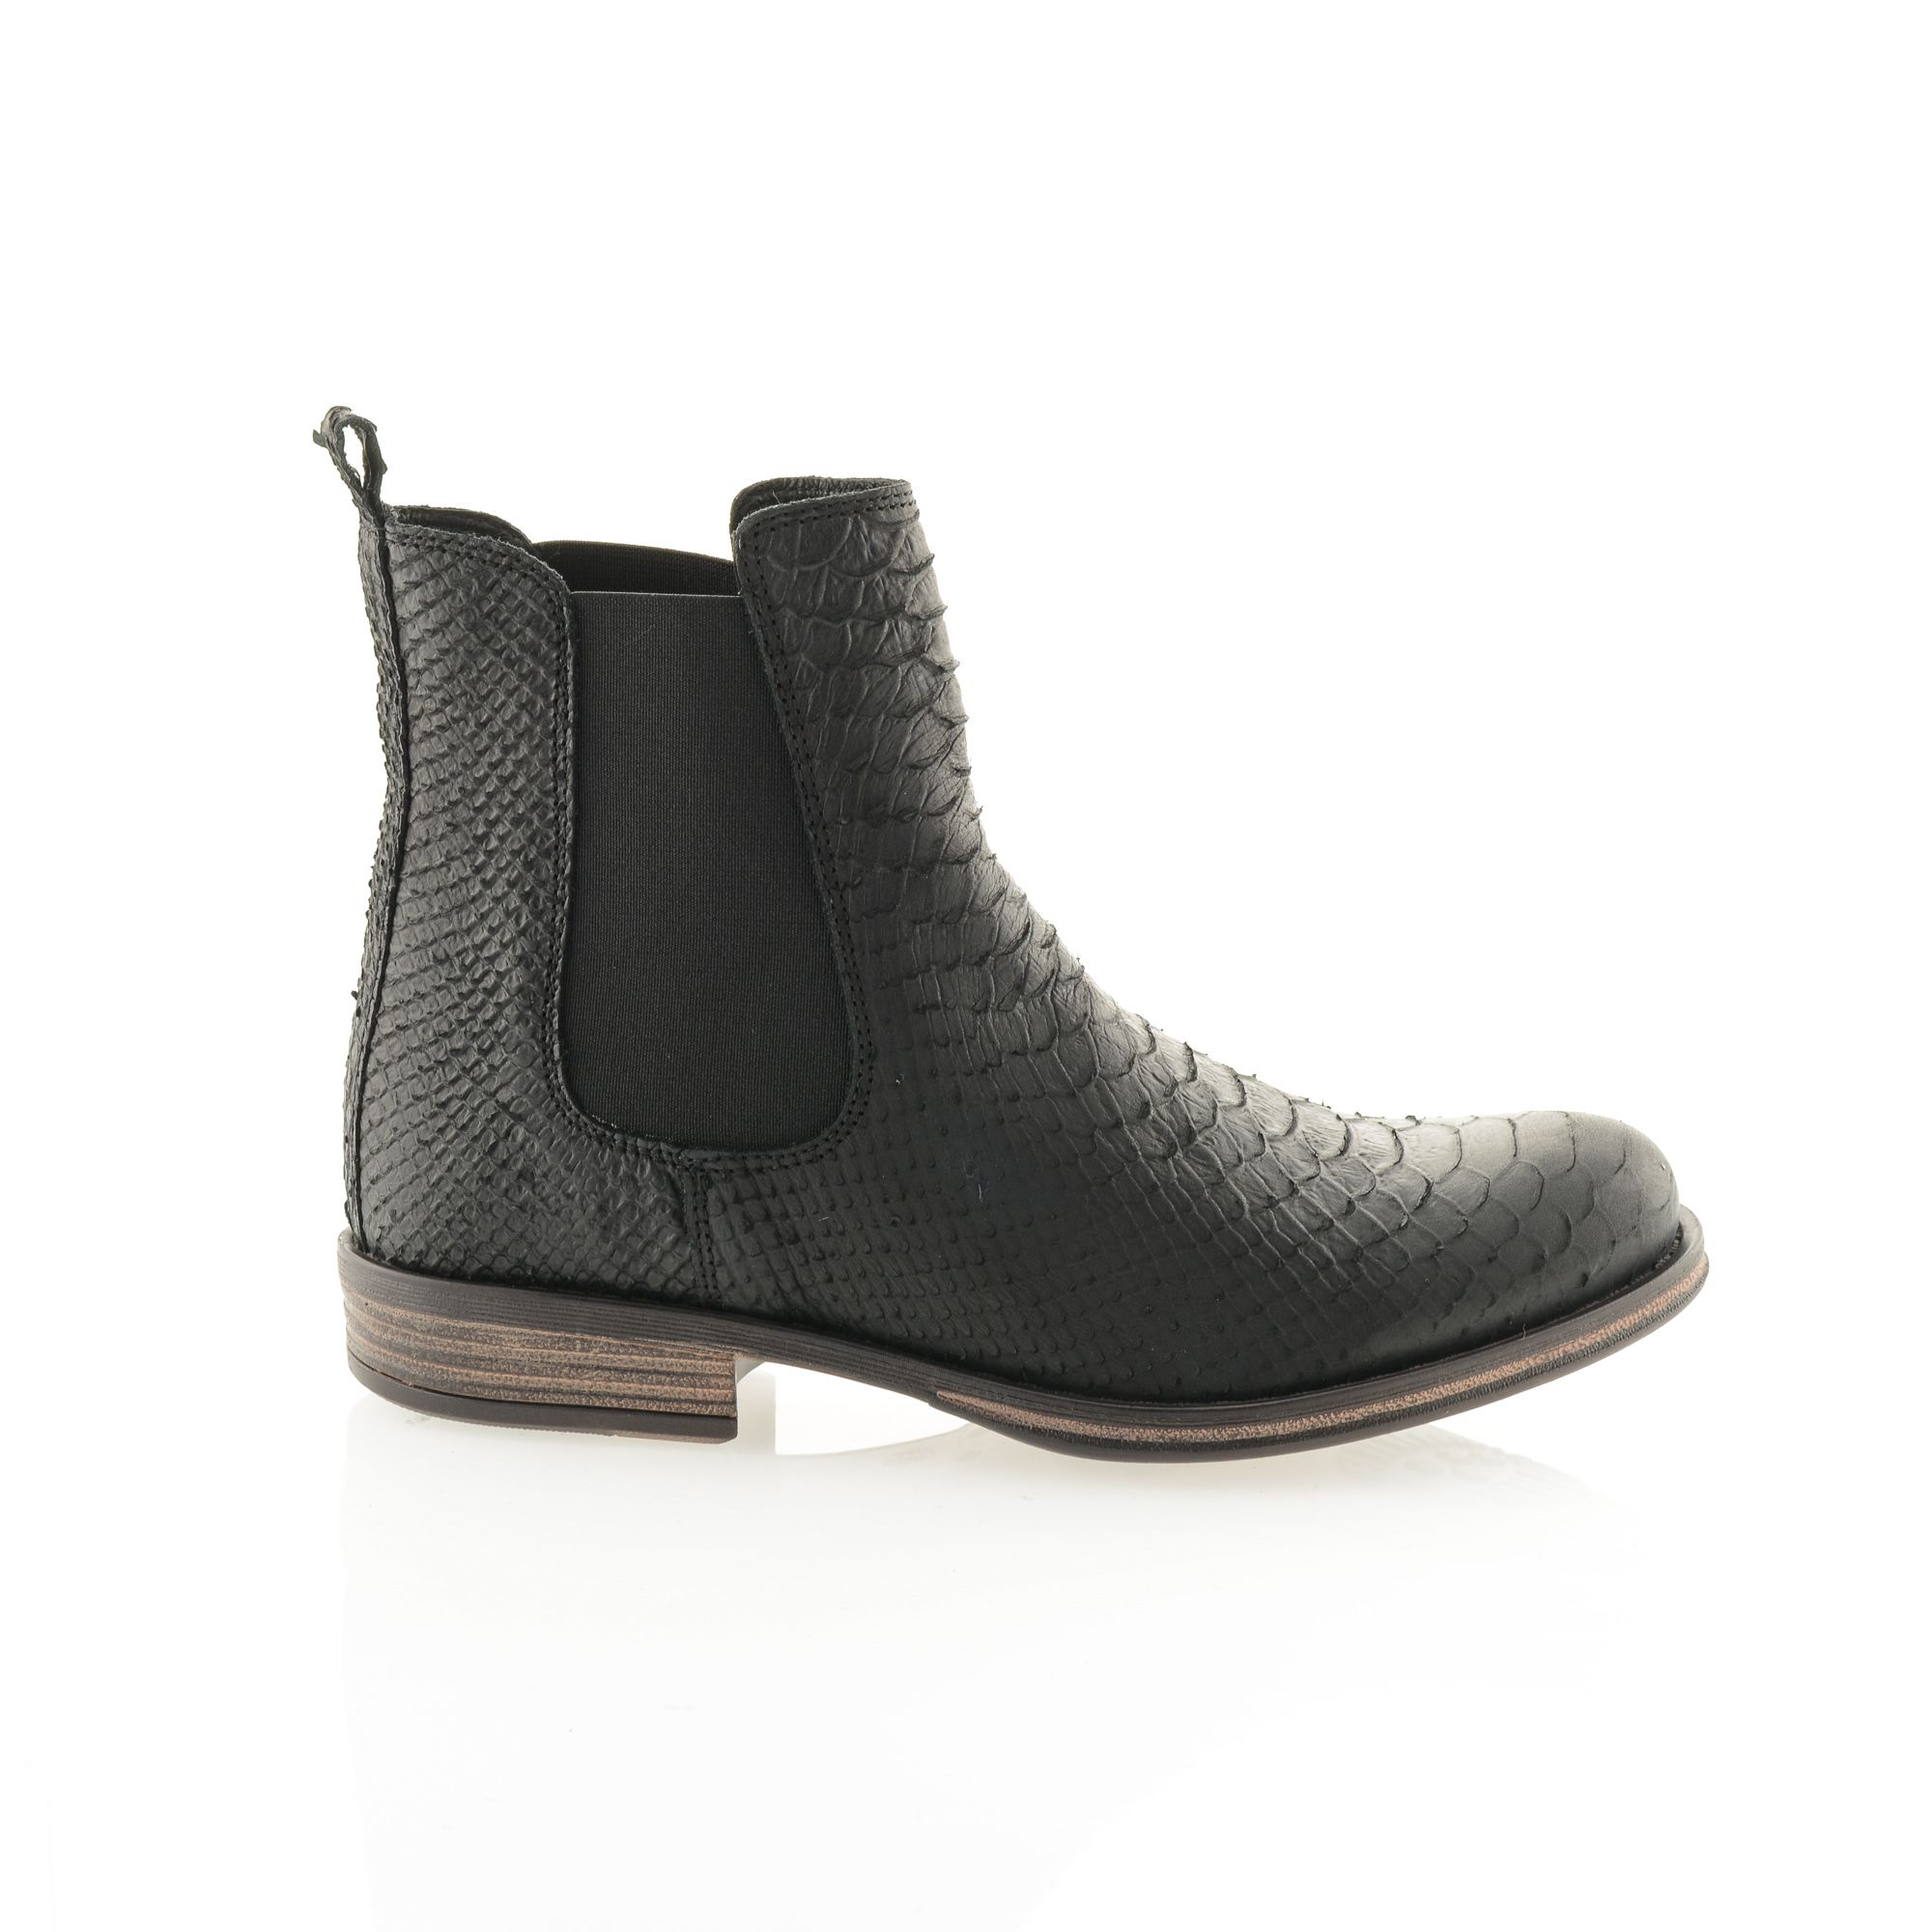 b6ba3ce6061c Støvle fra SIXMIX